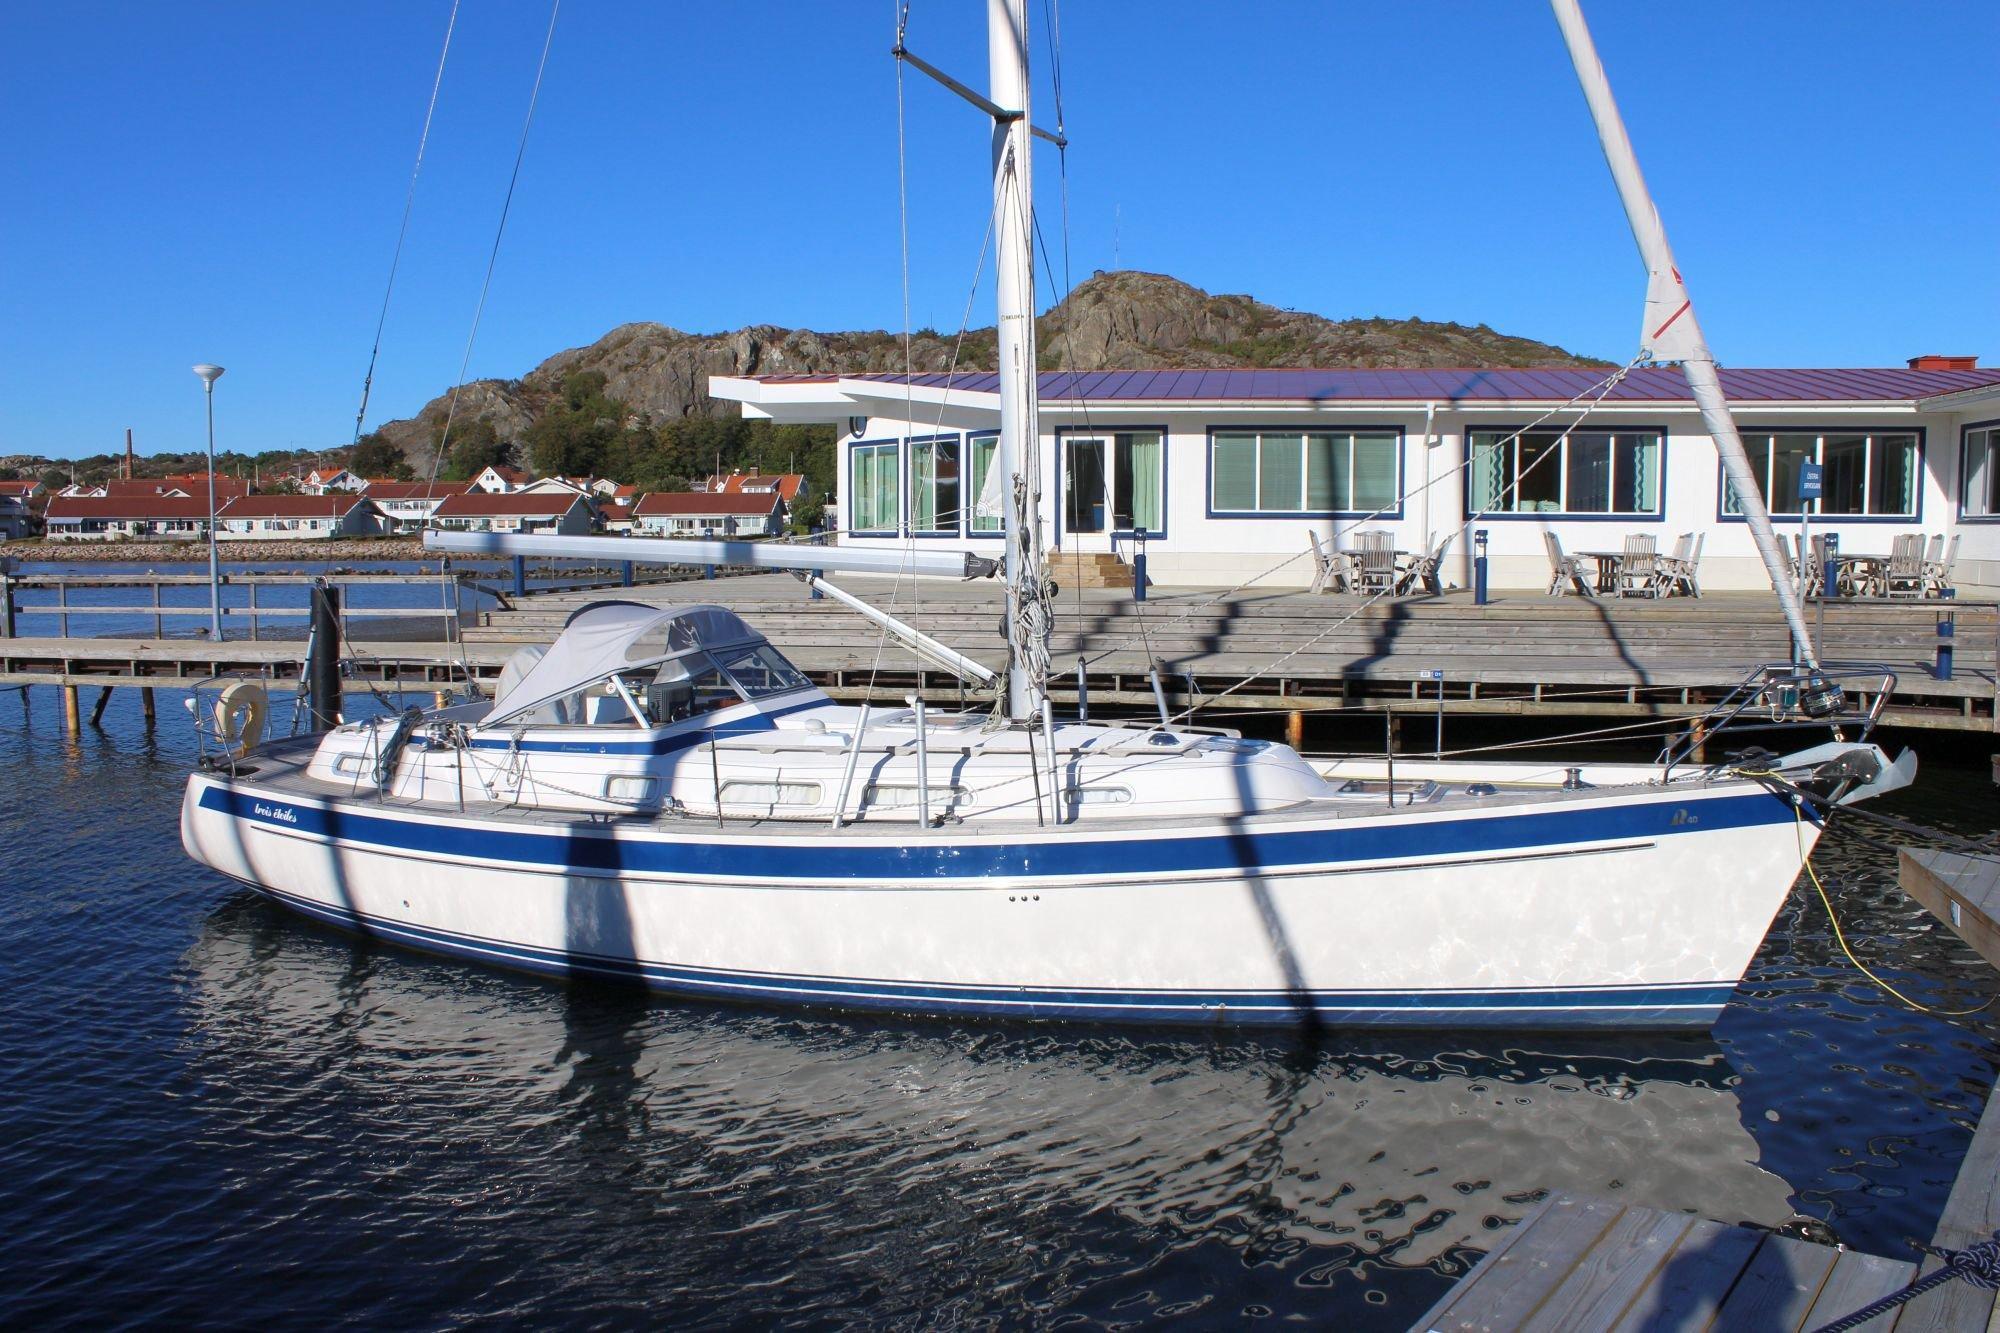 HallbergRassy 40 for sale  YachtWorld UK